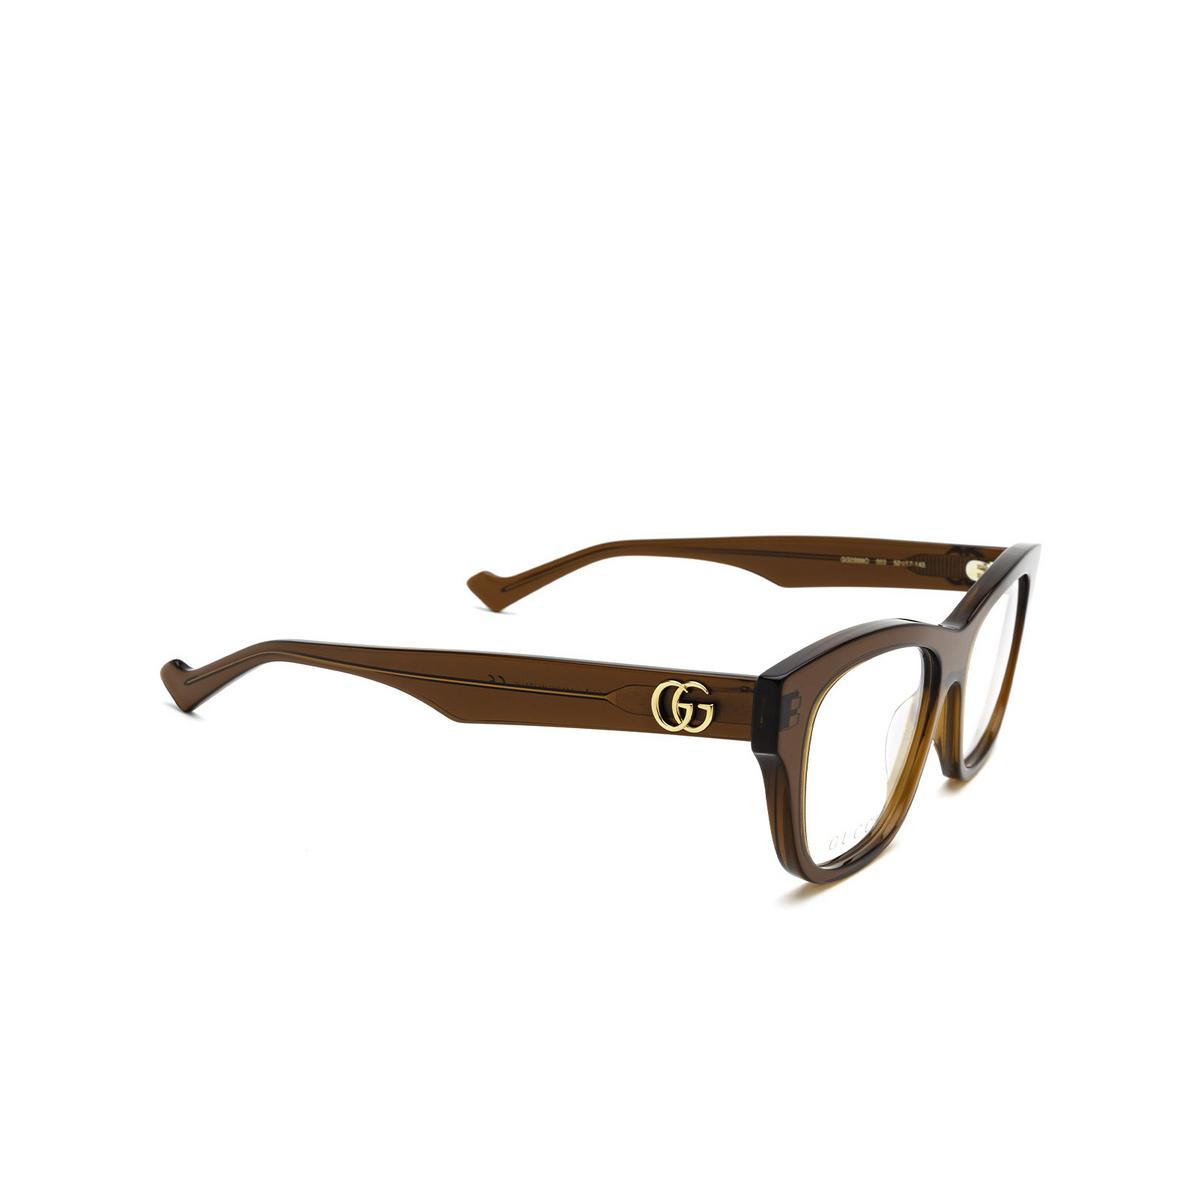 Gucci® Cat-eye Eyeglasses: GG0999O color Brown 003 - three-quarters view.